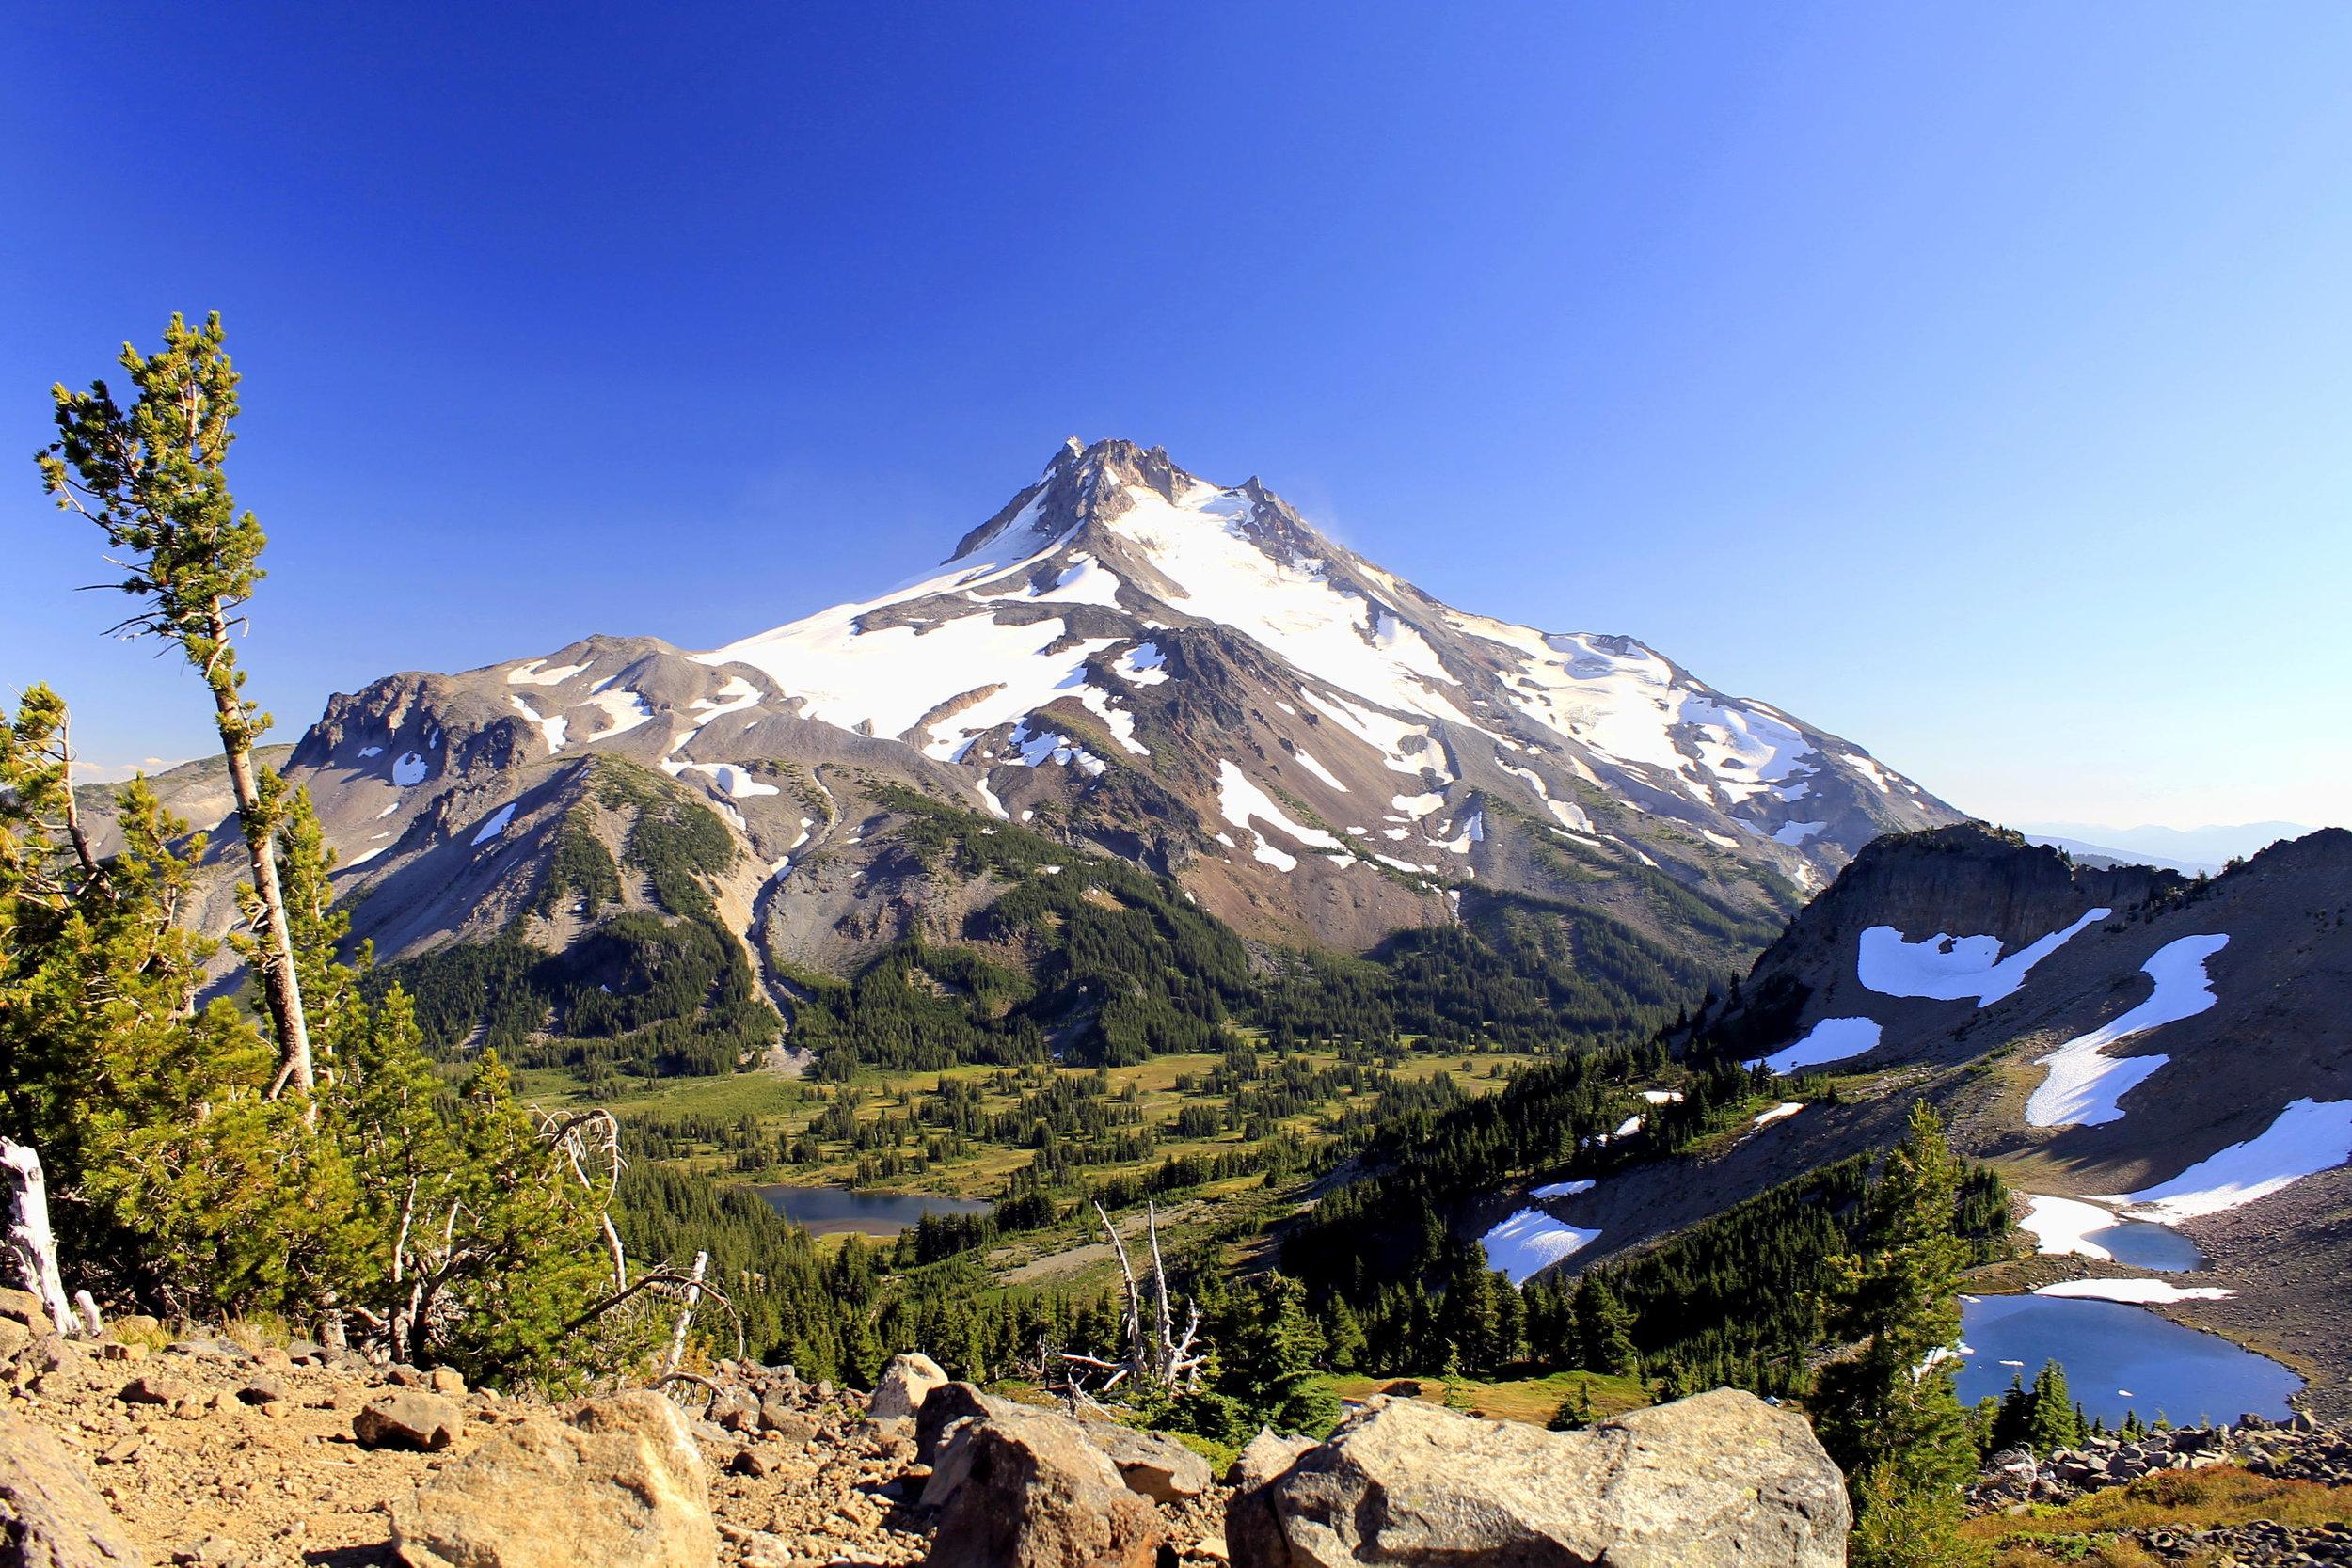 The viewpoint at Park Ridge.